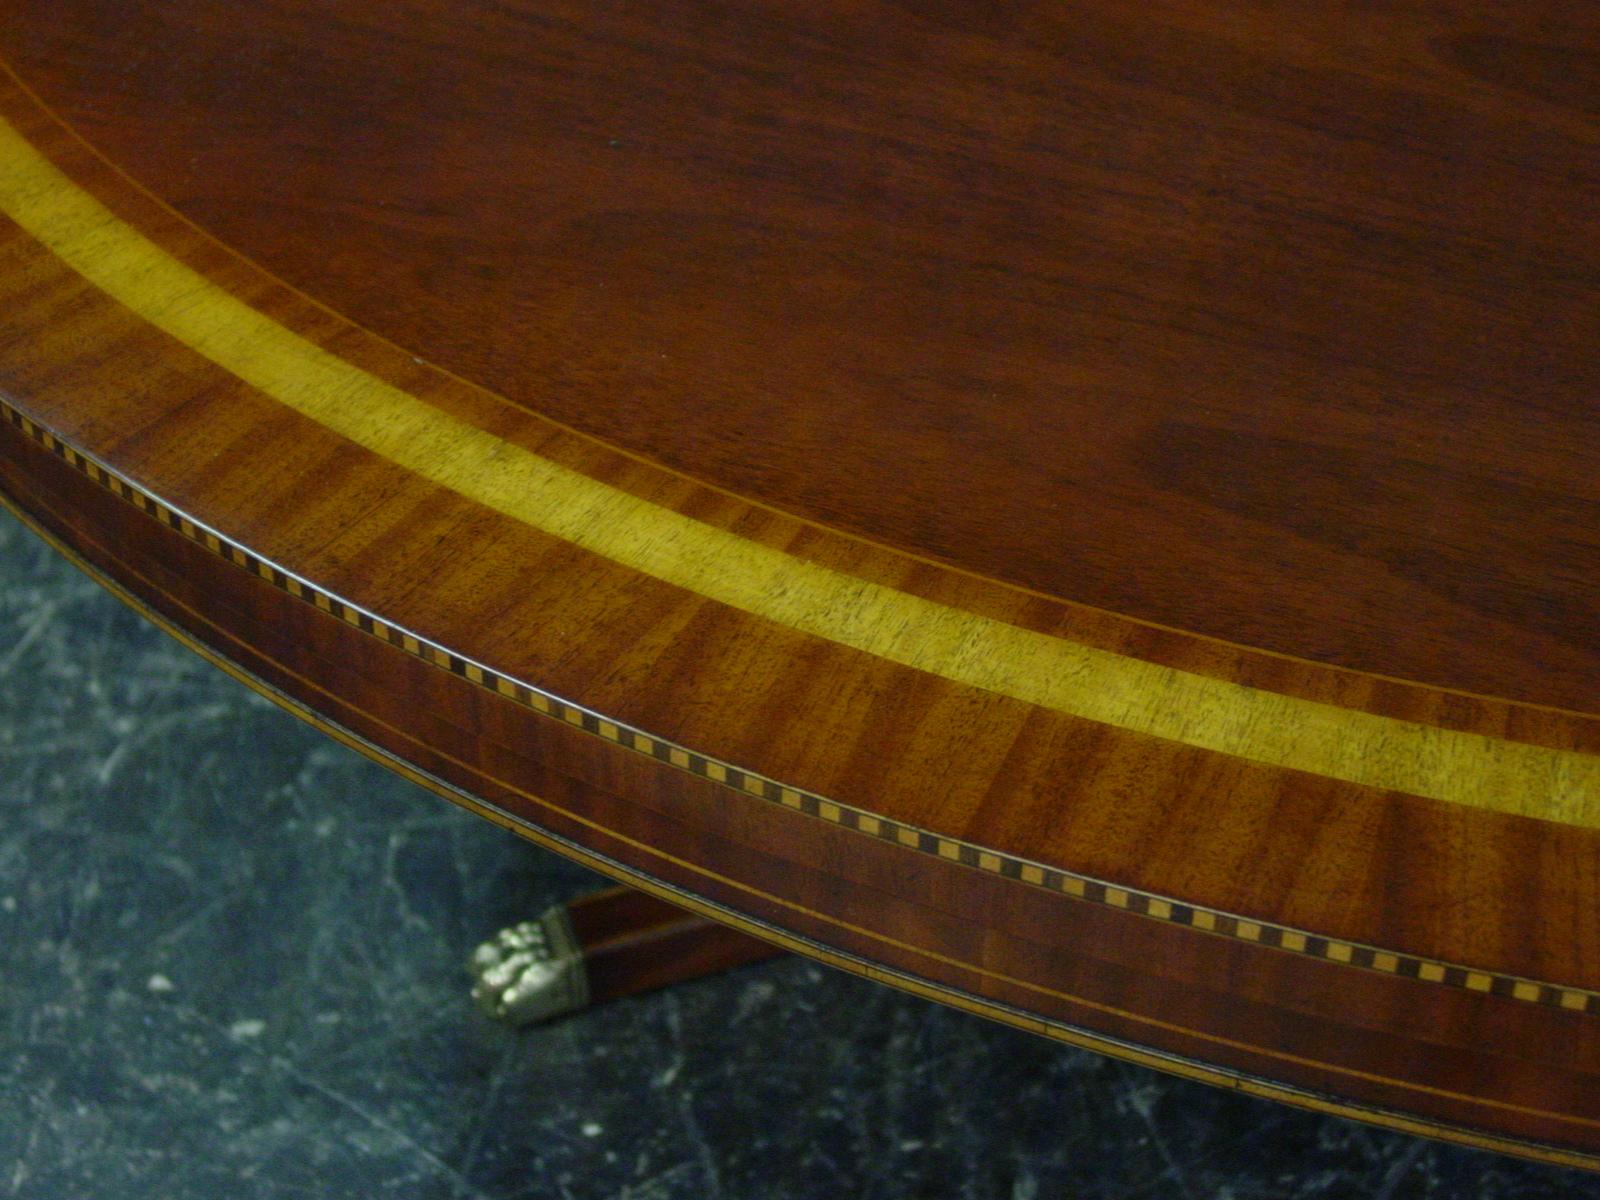 Table detail showing the custom satin banded mahogany table